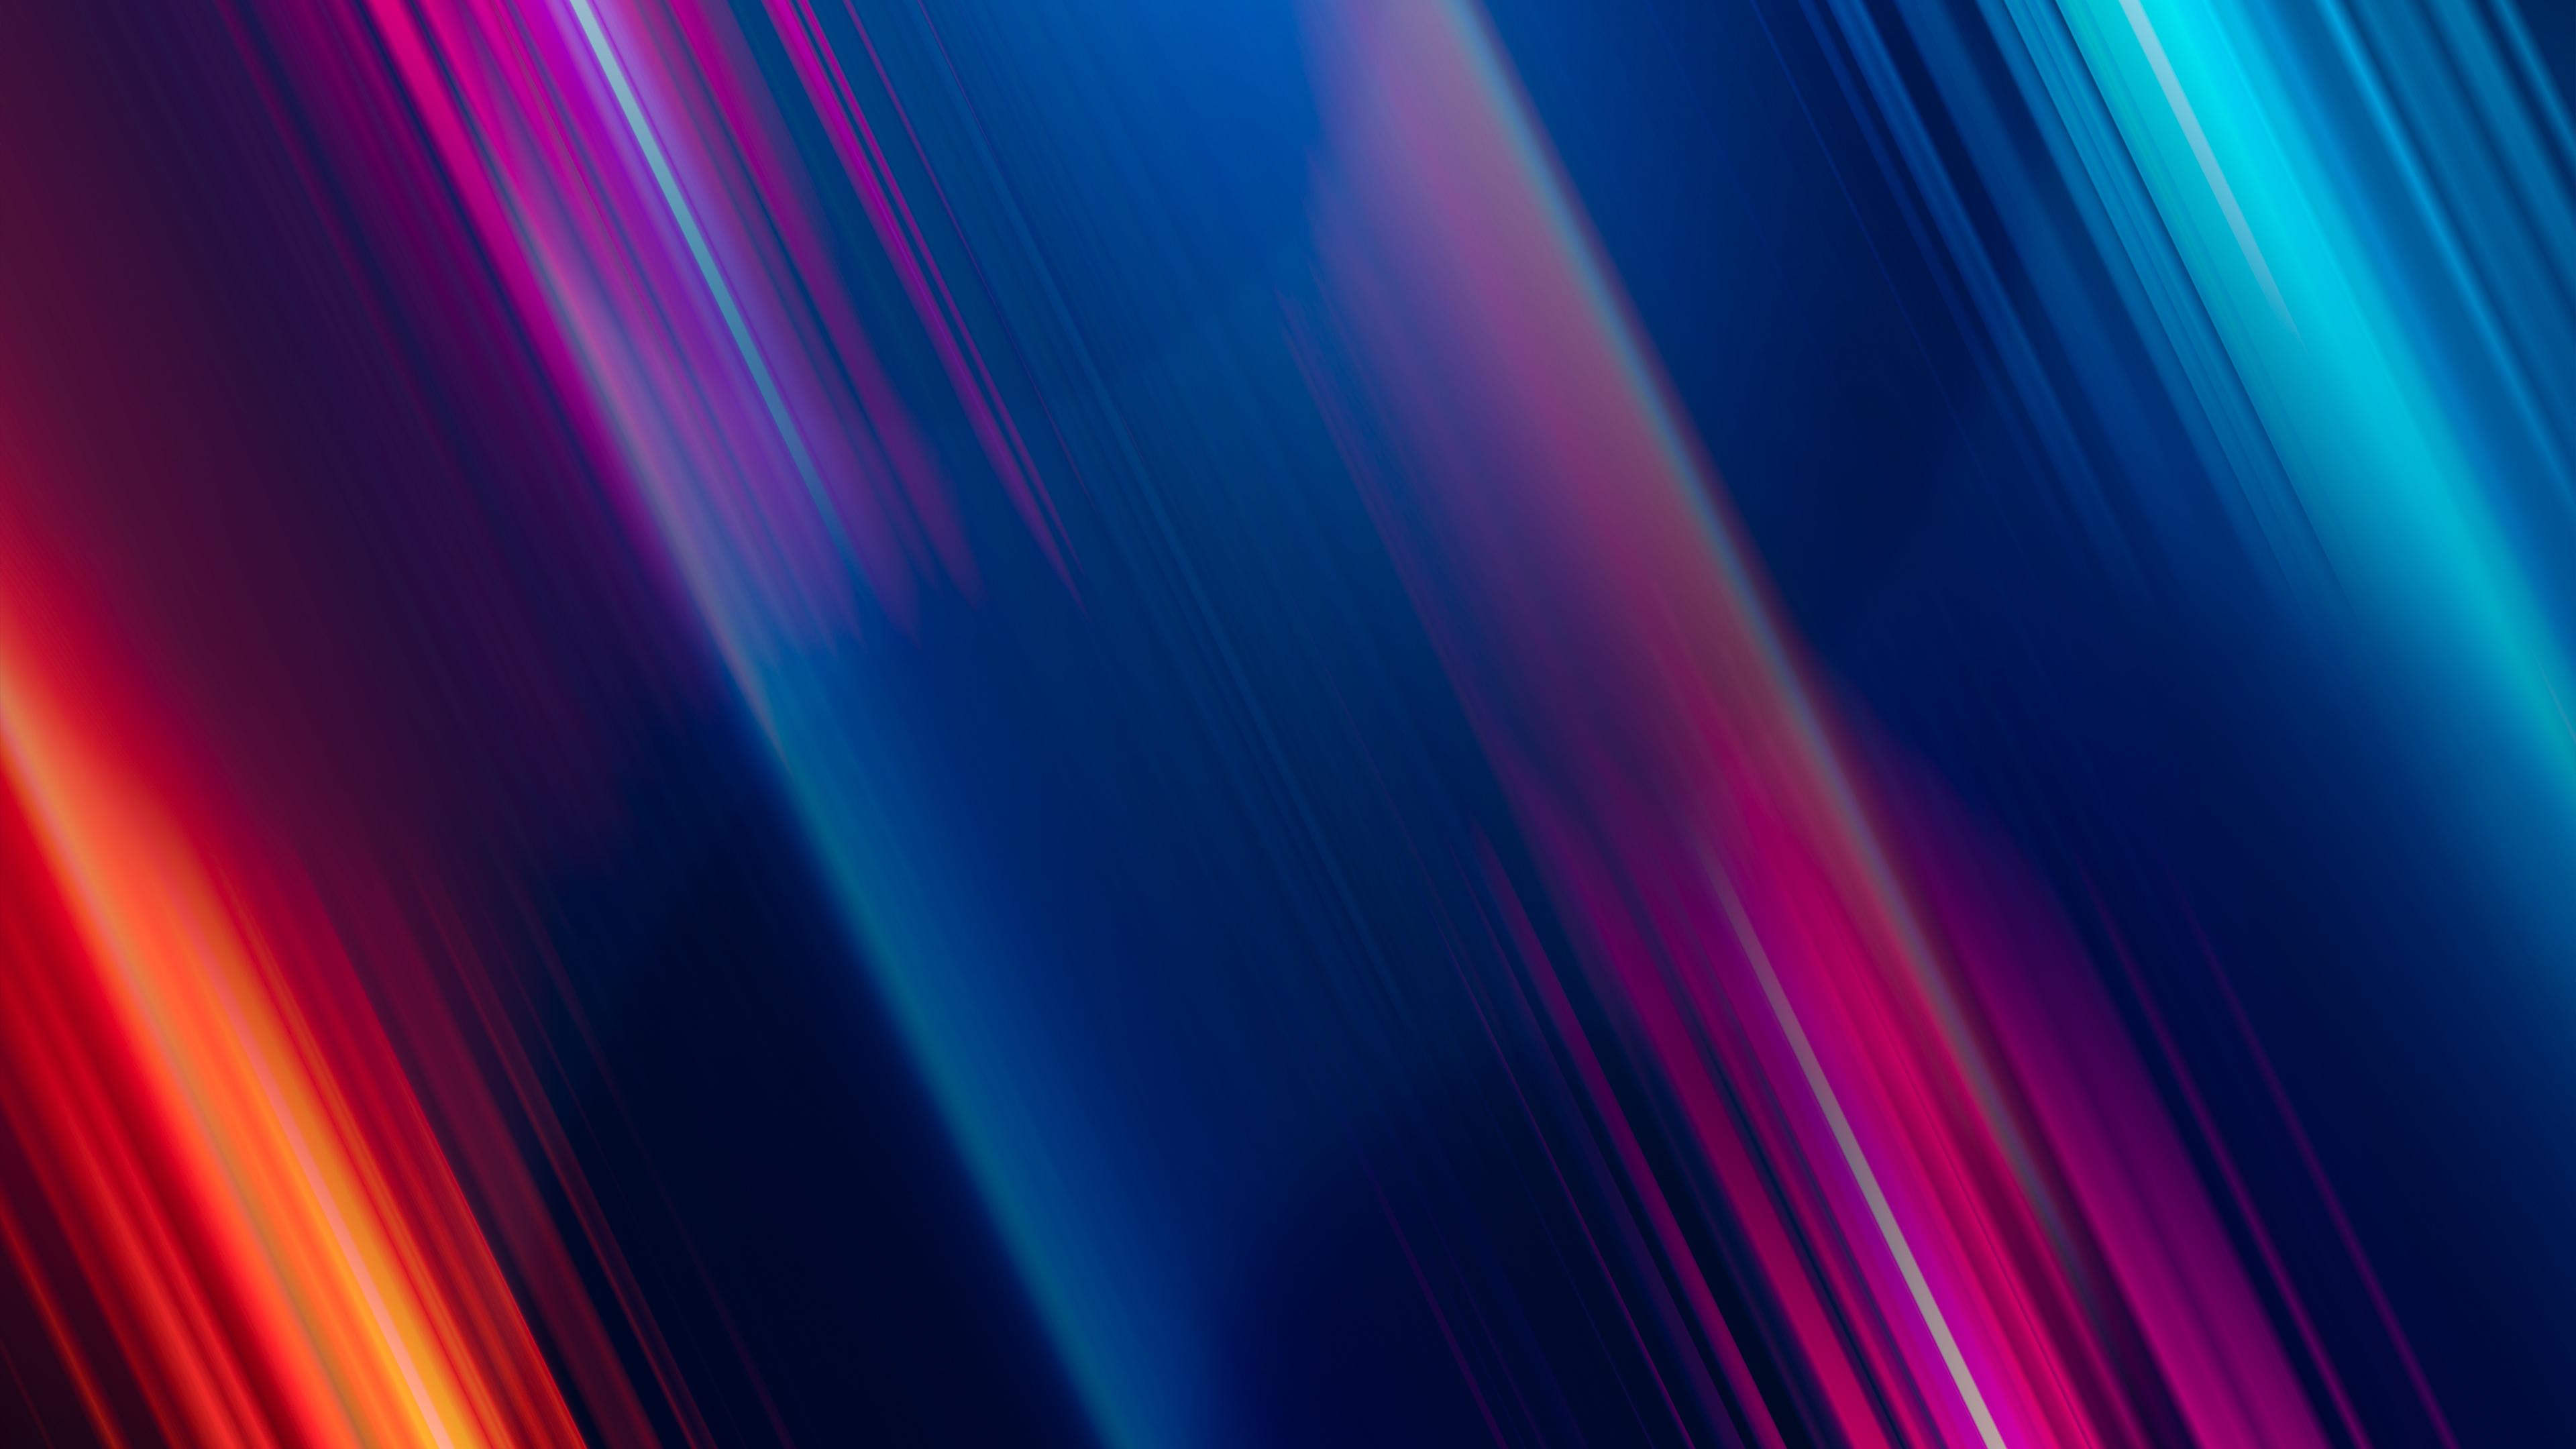 color vibe abstract 4k 1602442042 - Color Vibe Abstract 4k - Color Vibe Abstract 4k wallpapers